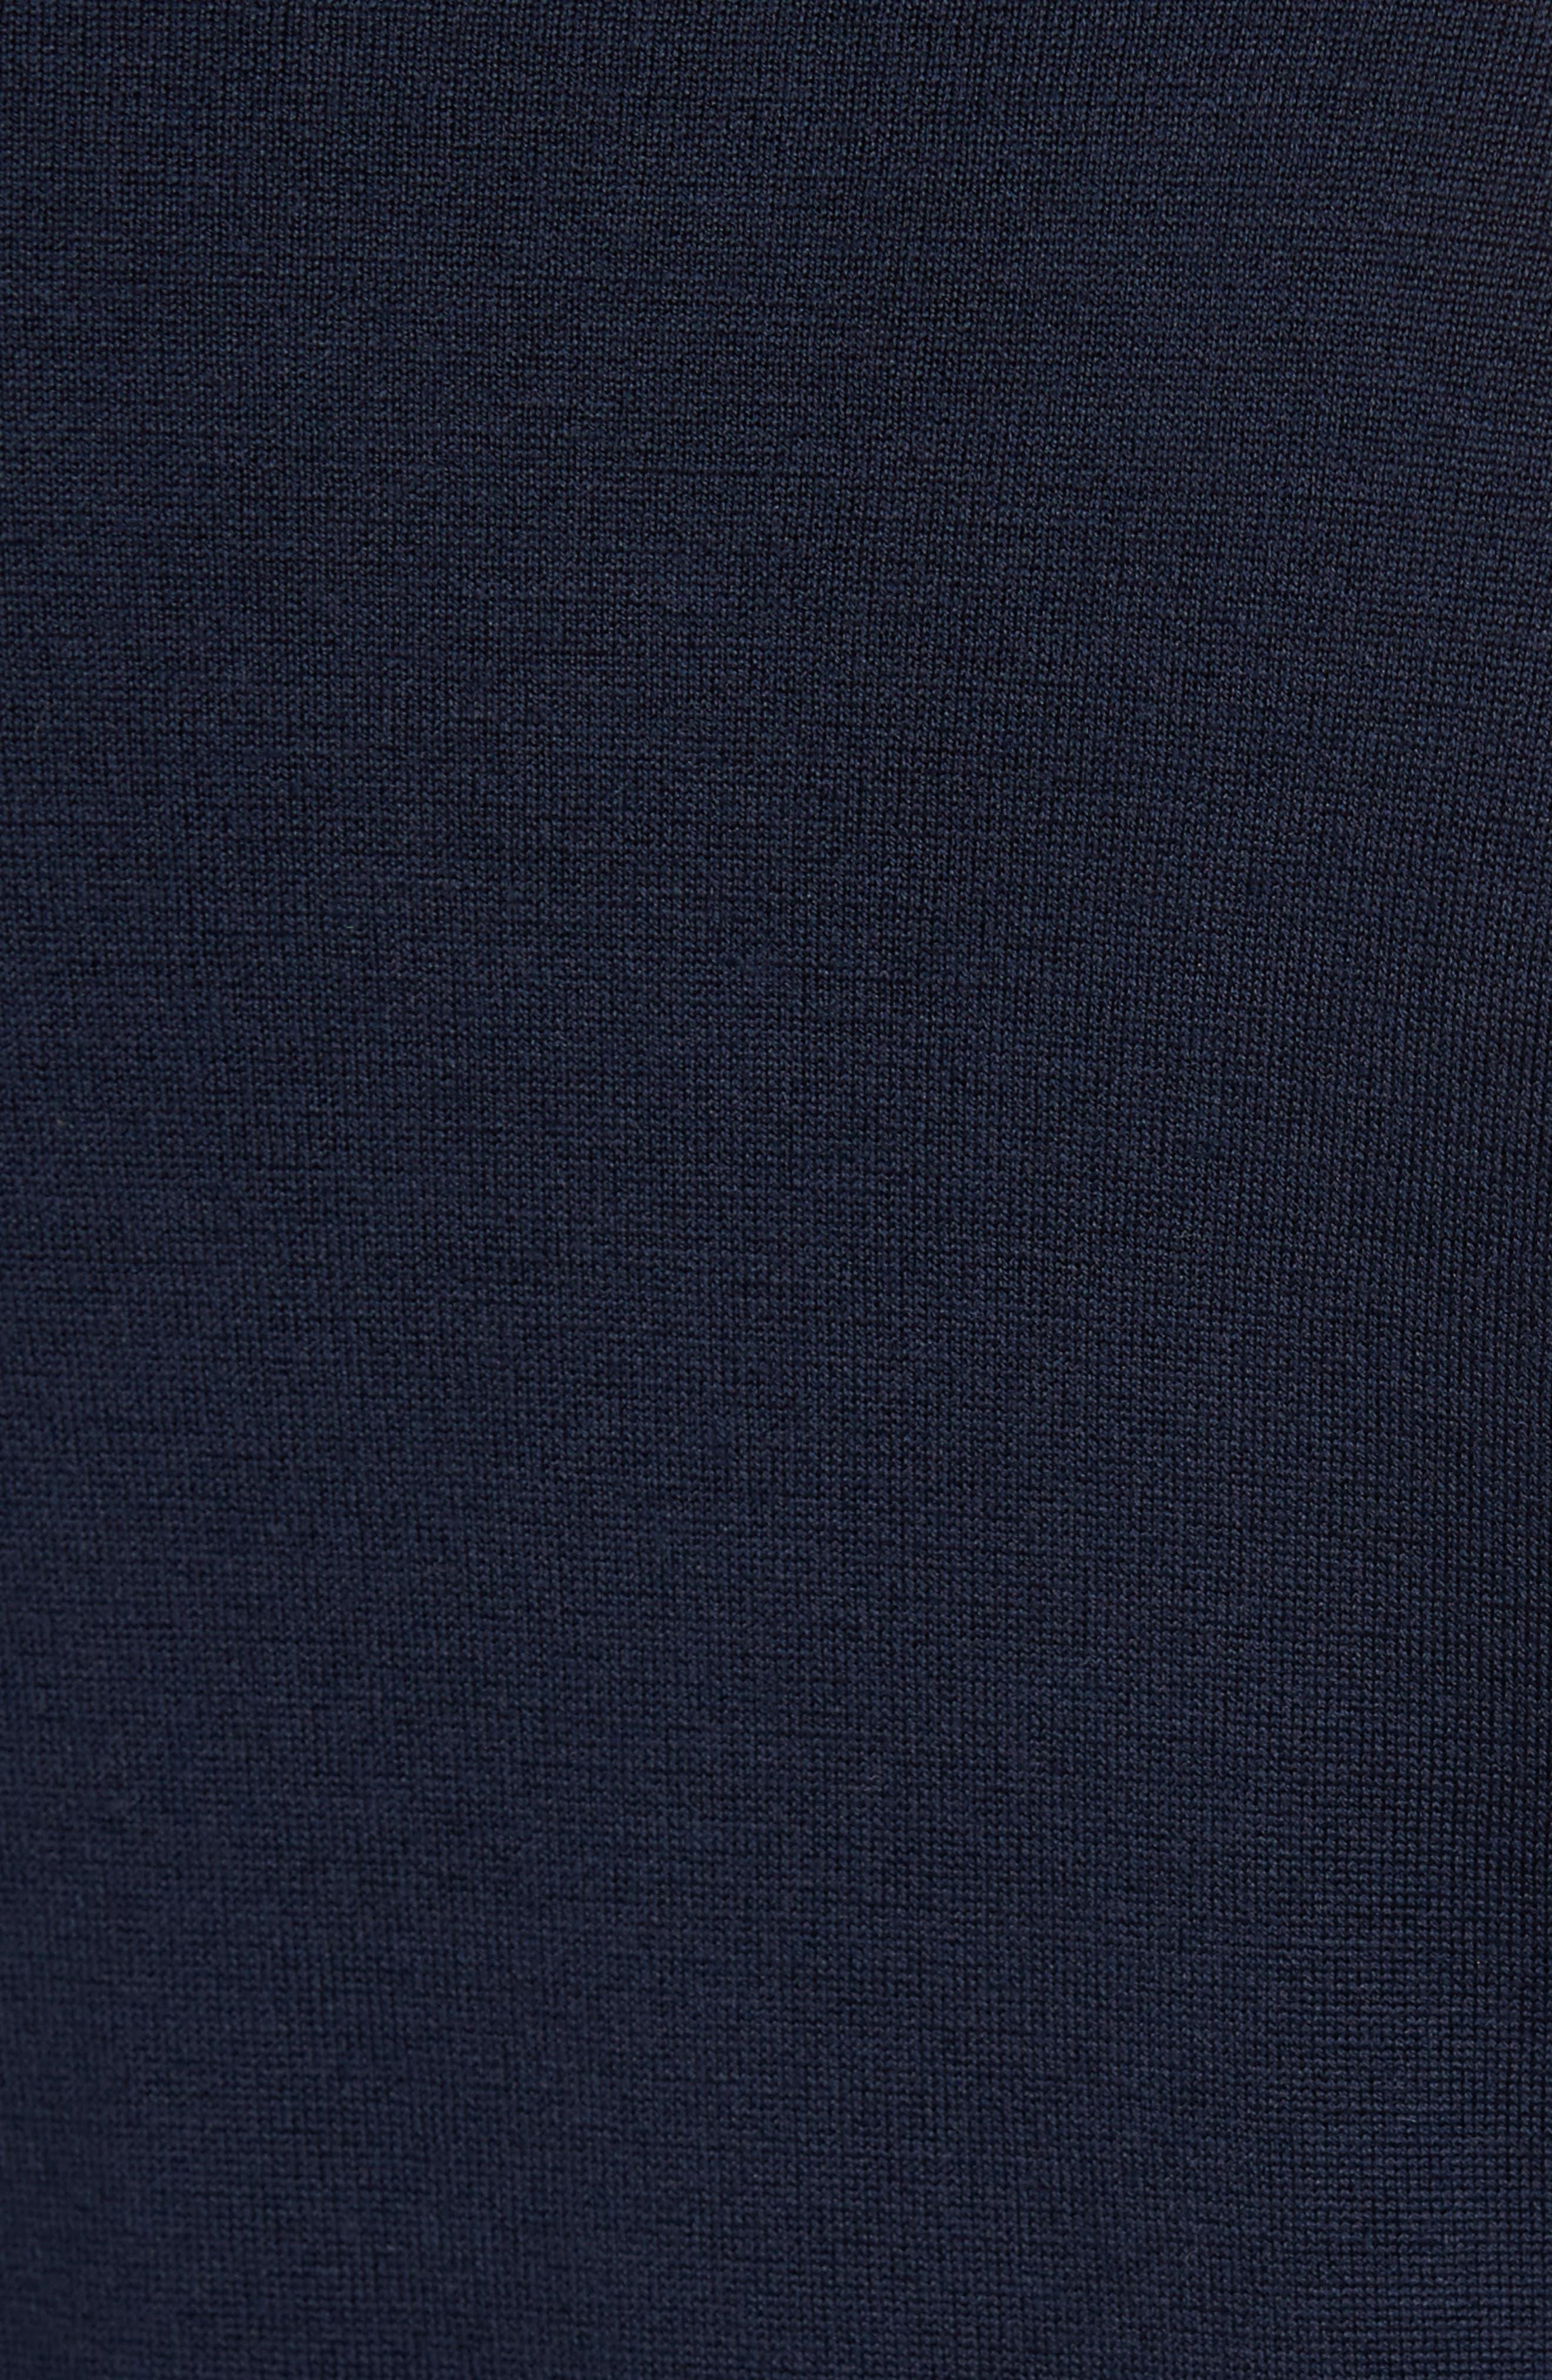 Merino Wool Sweater,                             Alternate thumbnail 16, color,